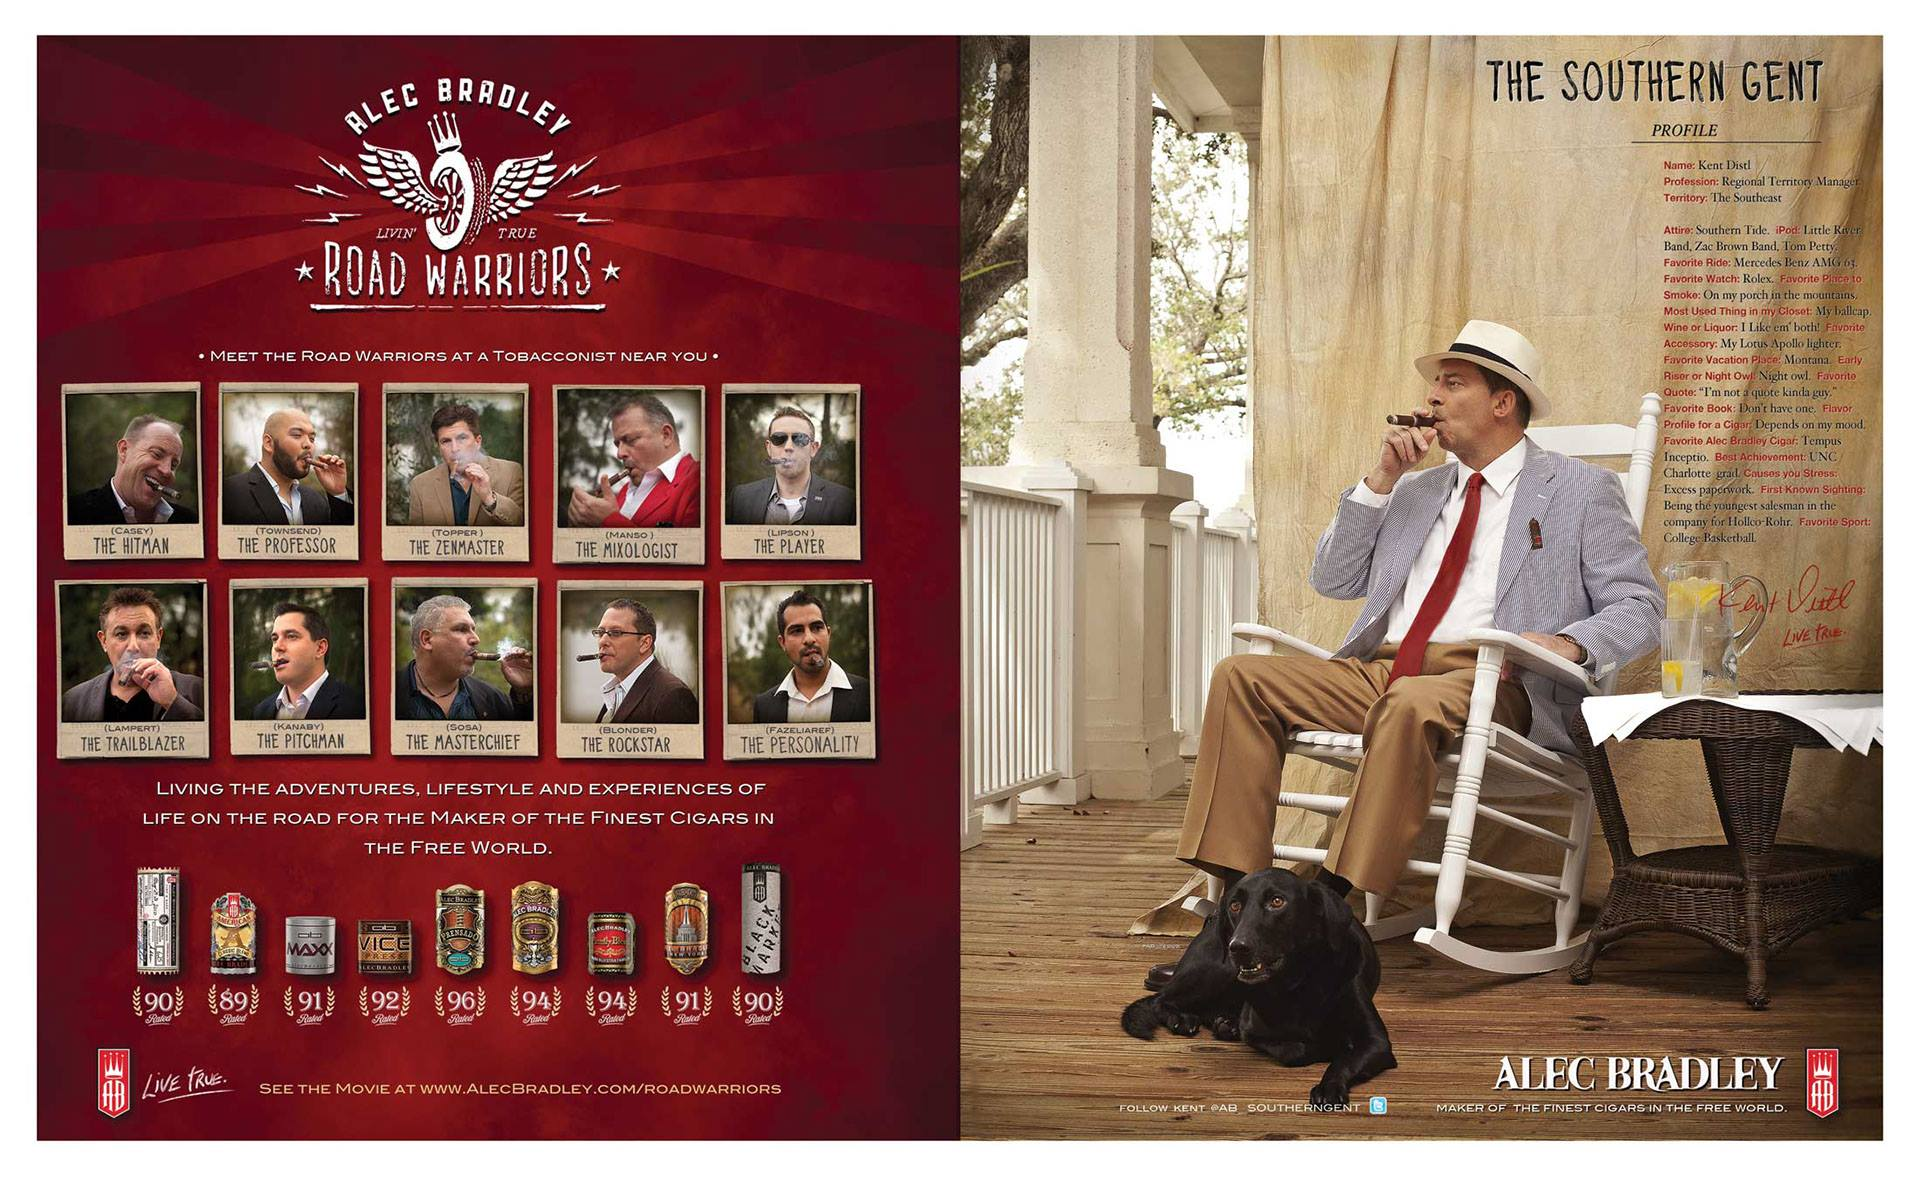 alec_bradley_cigars_staff_cigarmonkeys_1.jpg